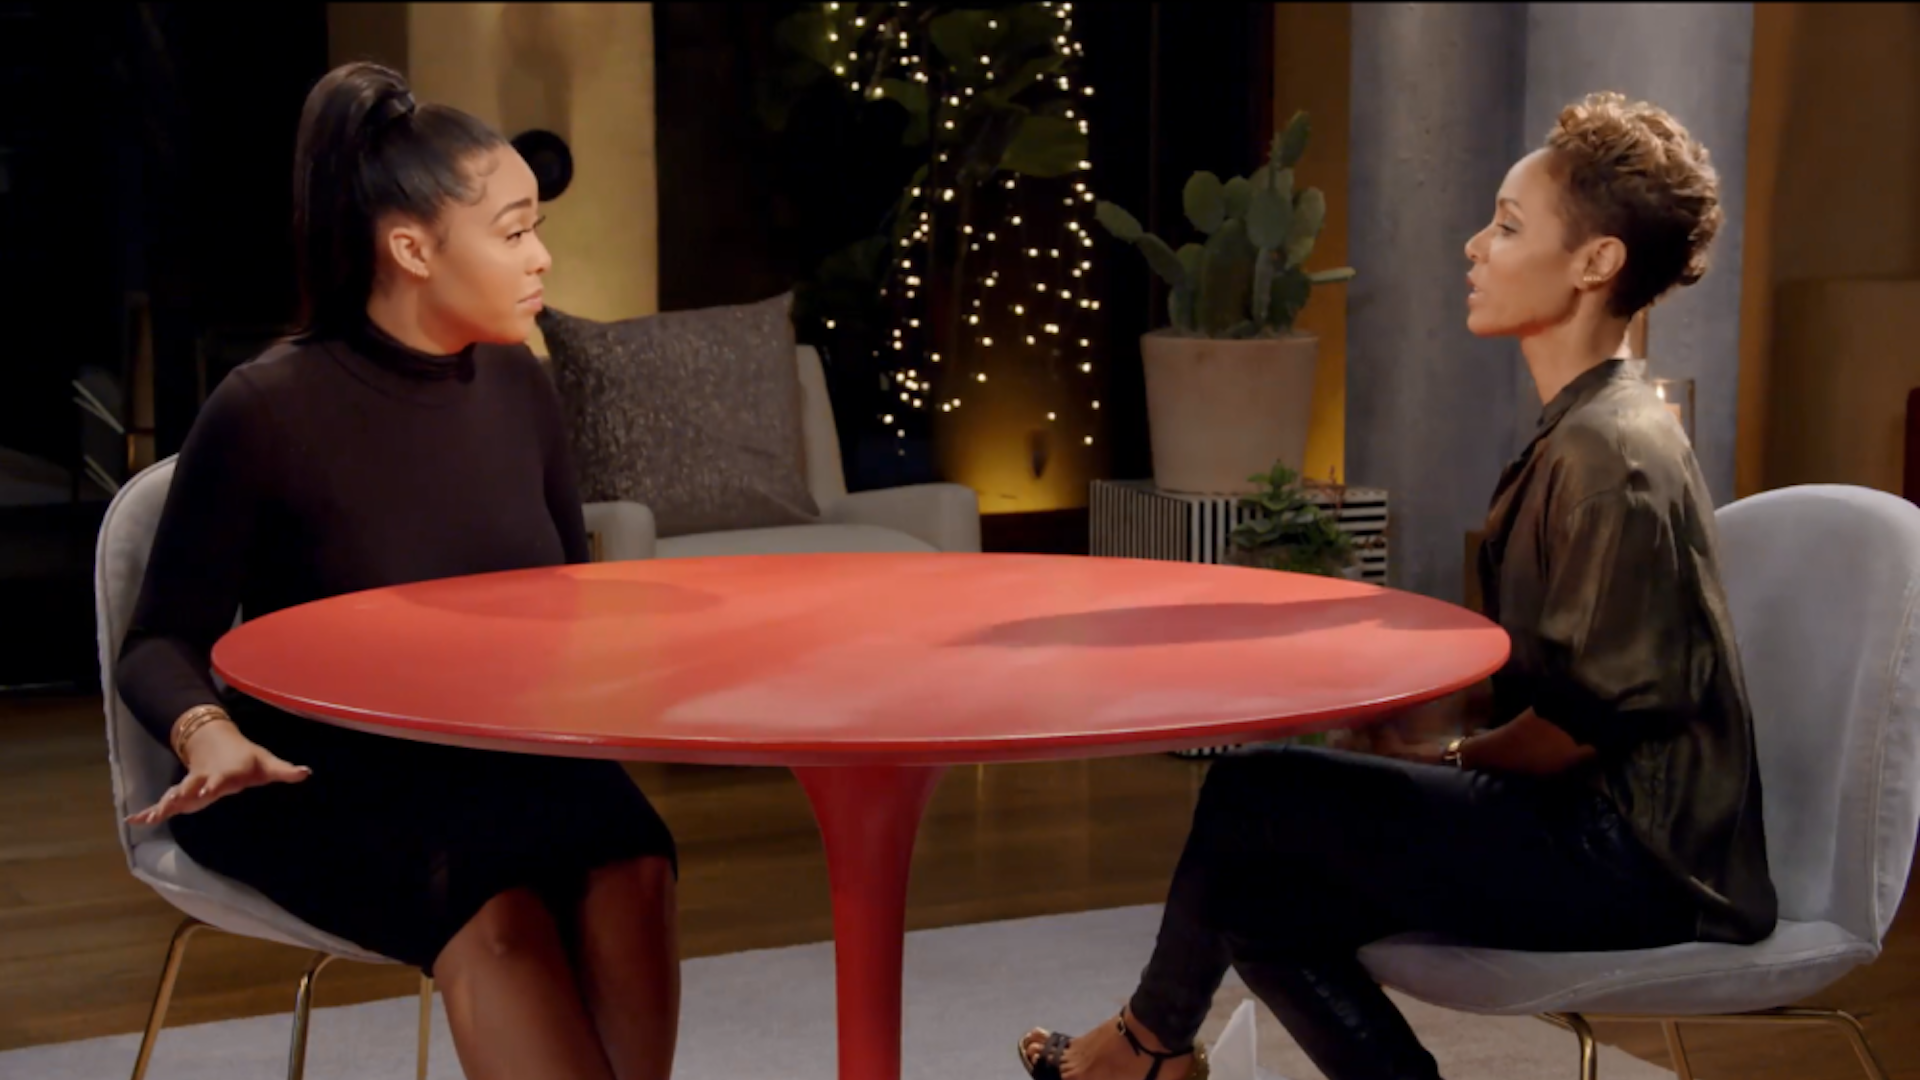 Jada Pinkett Smith Initially Didn't Want Jordyn Woods On 'Red Table Talk'